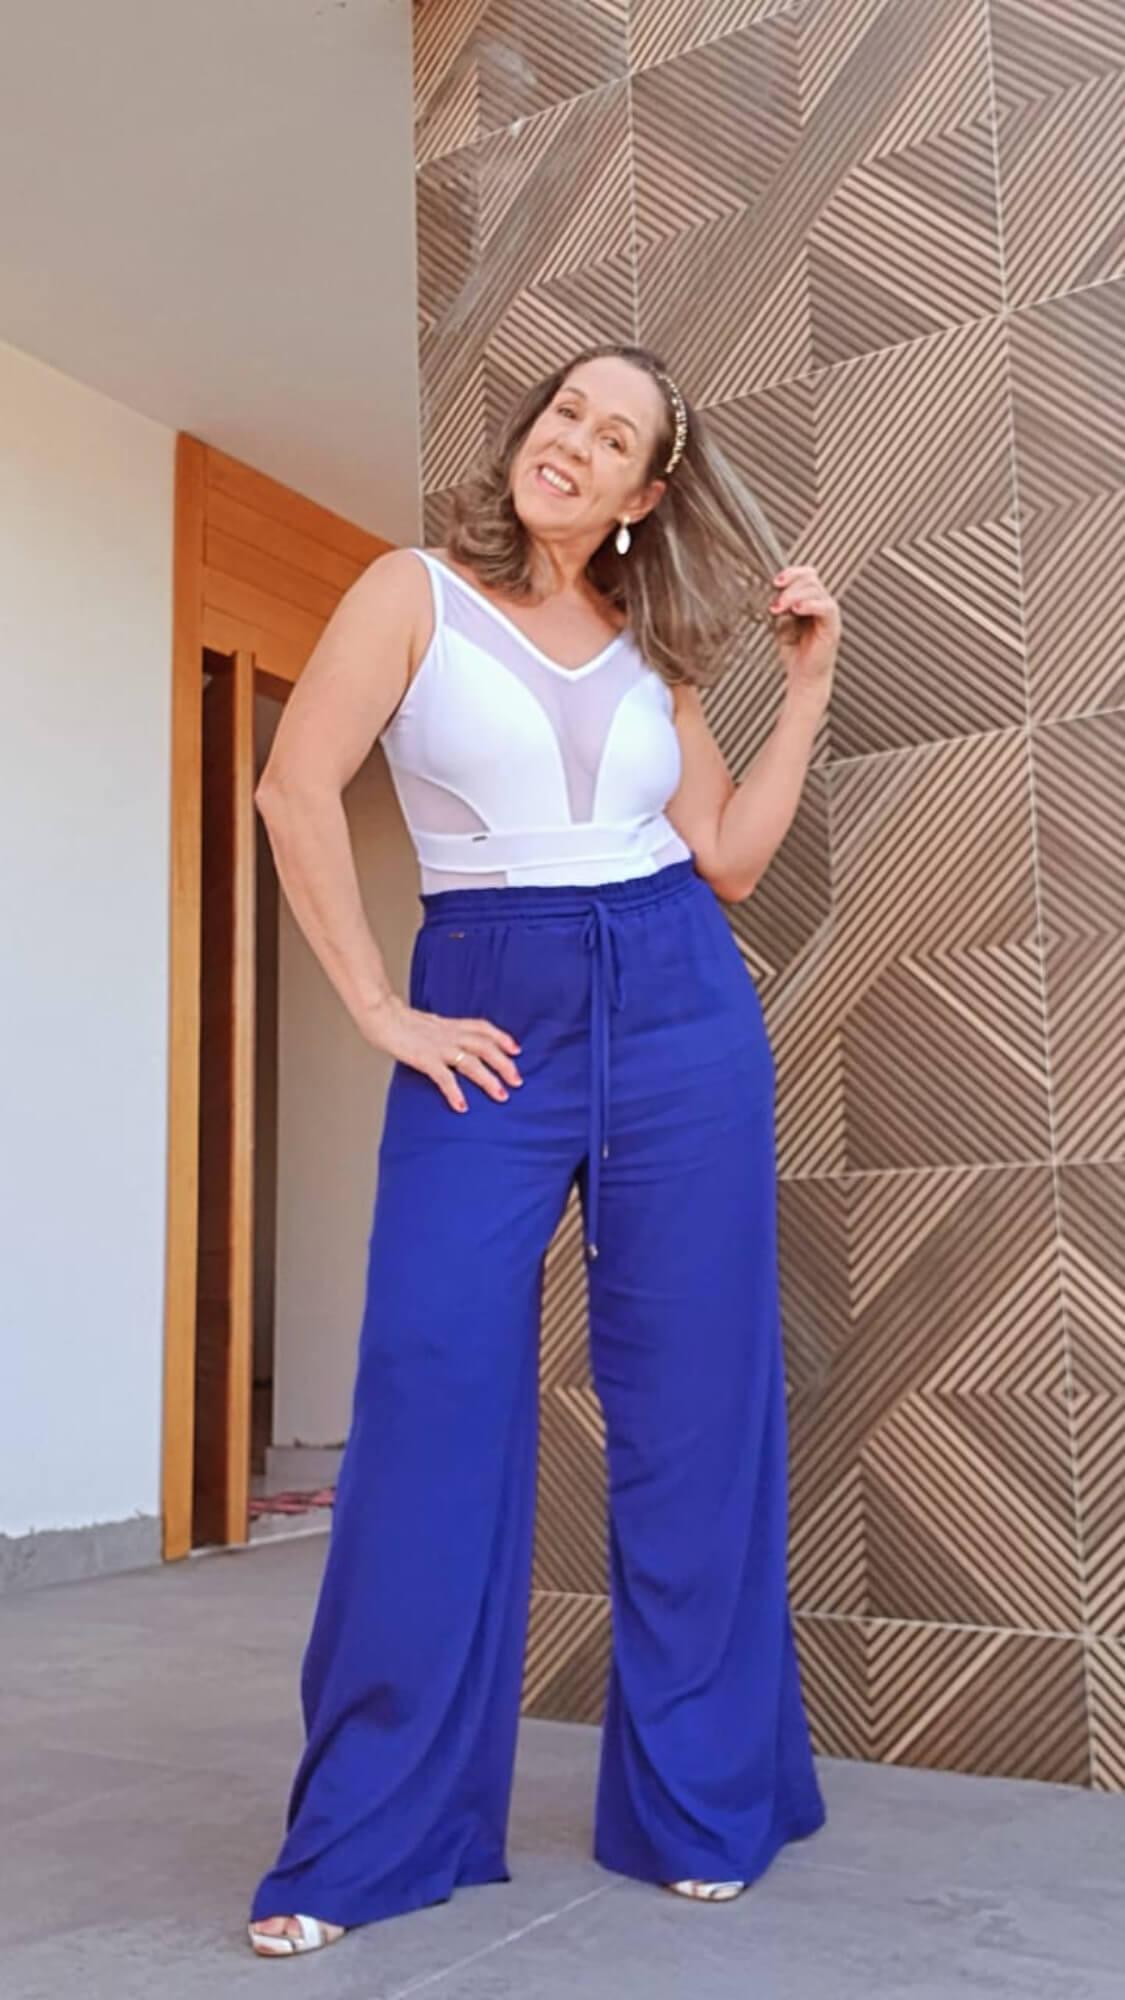 Look Completo : Maiô Premium Resort Branco + Pantalona Bolso Faca Azul Bic